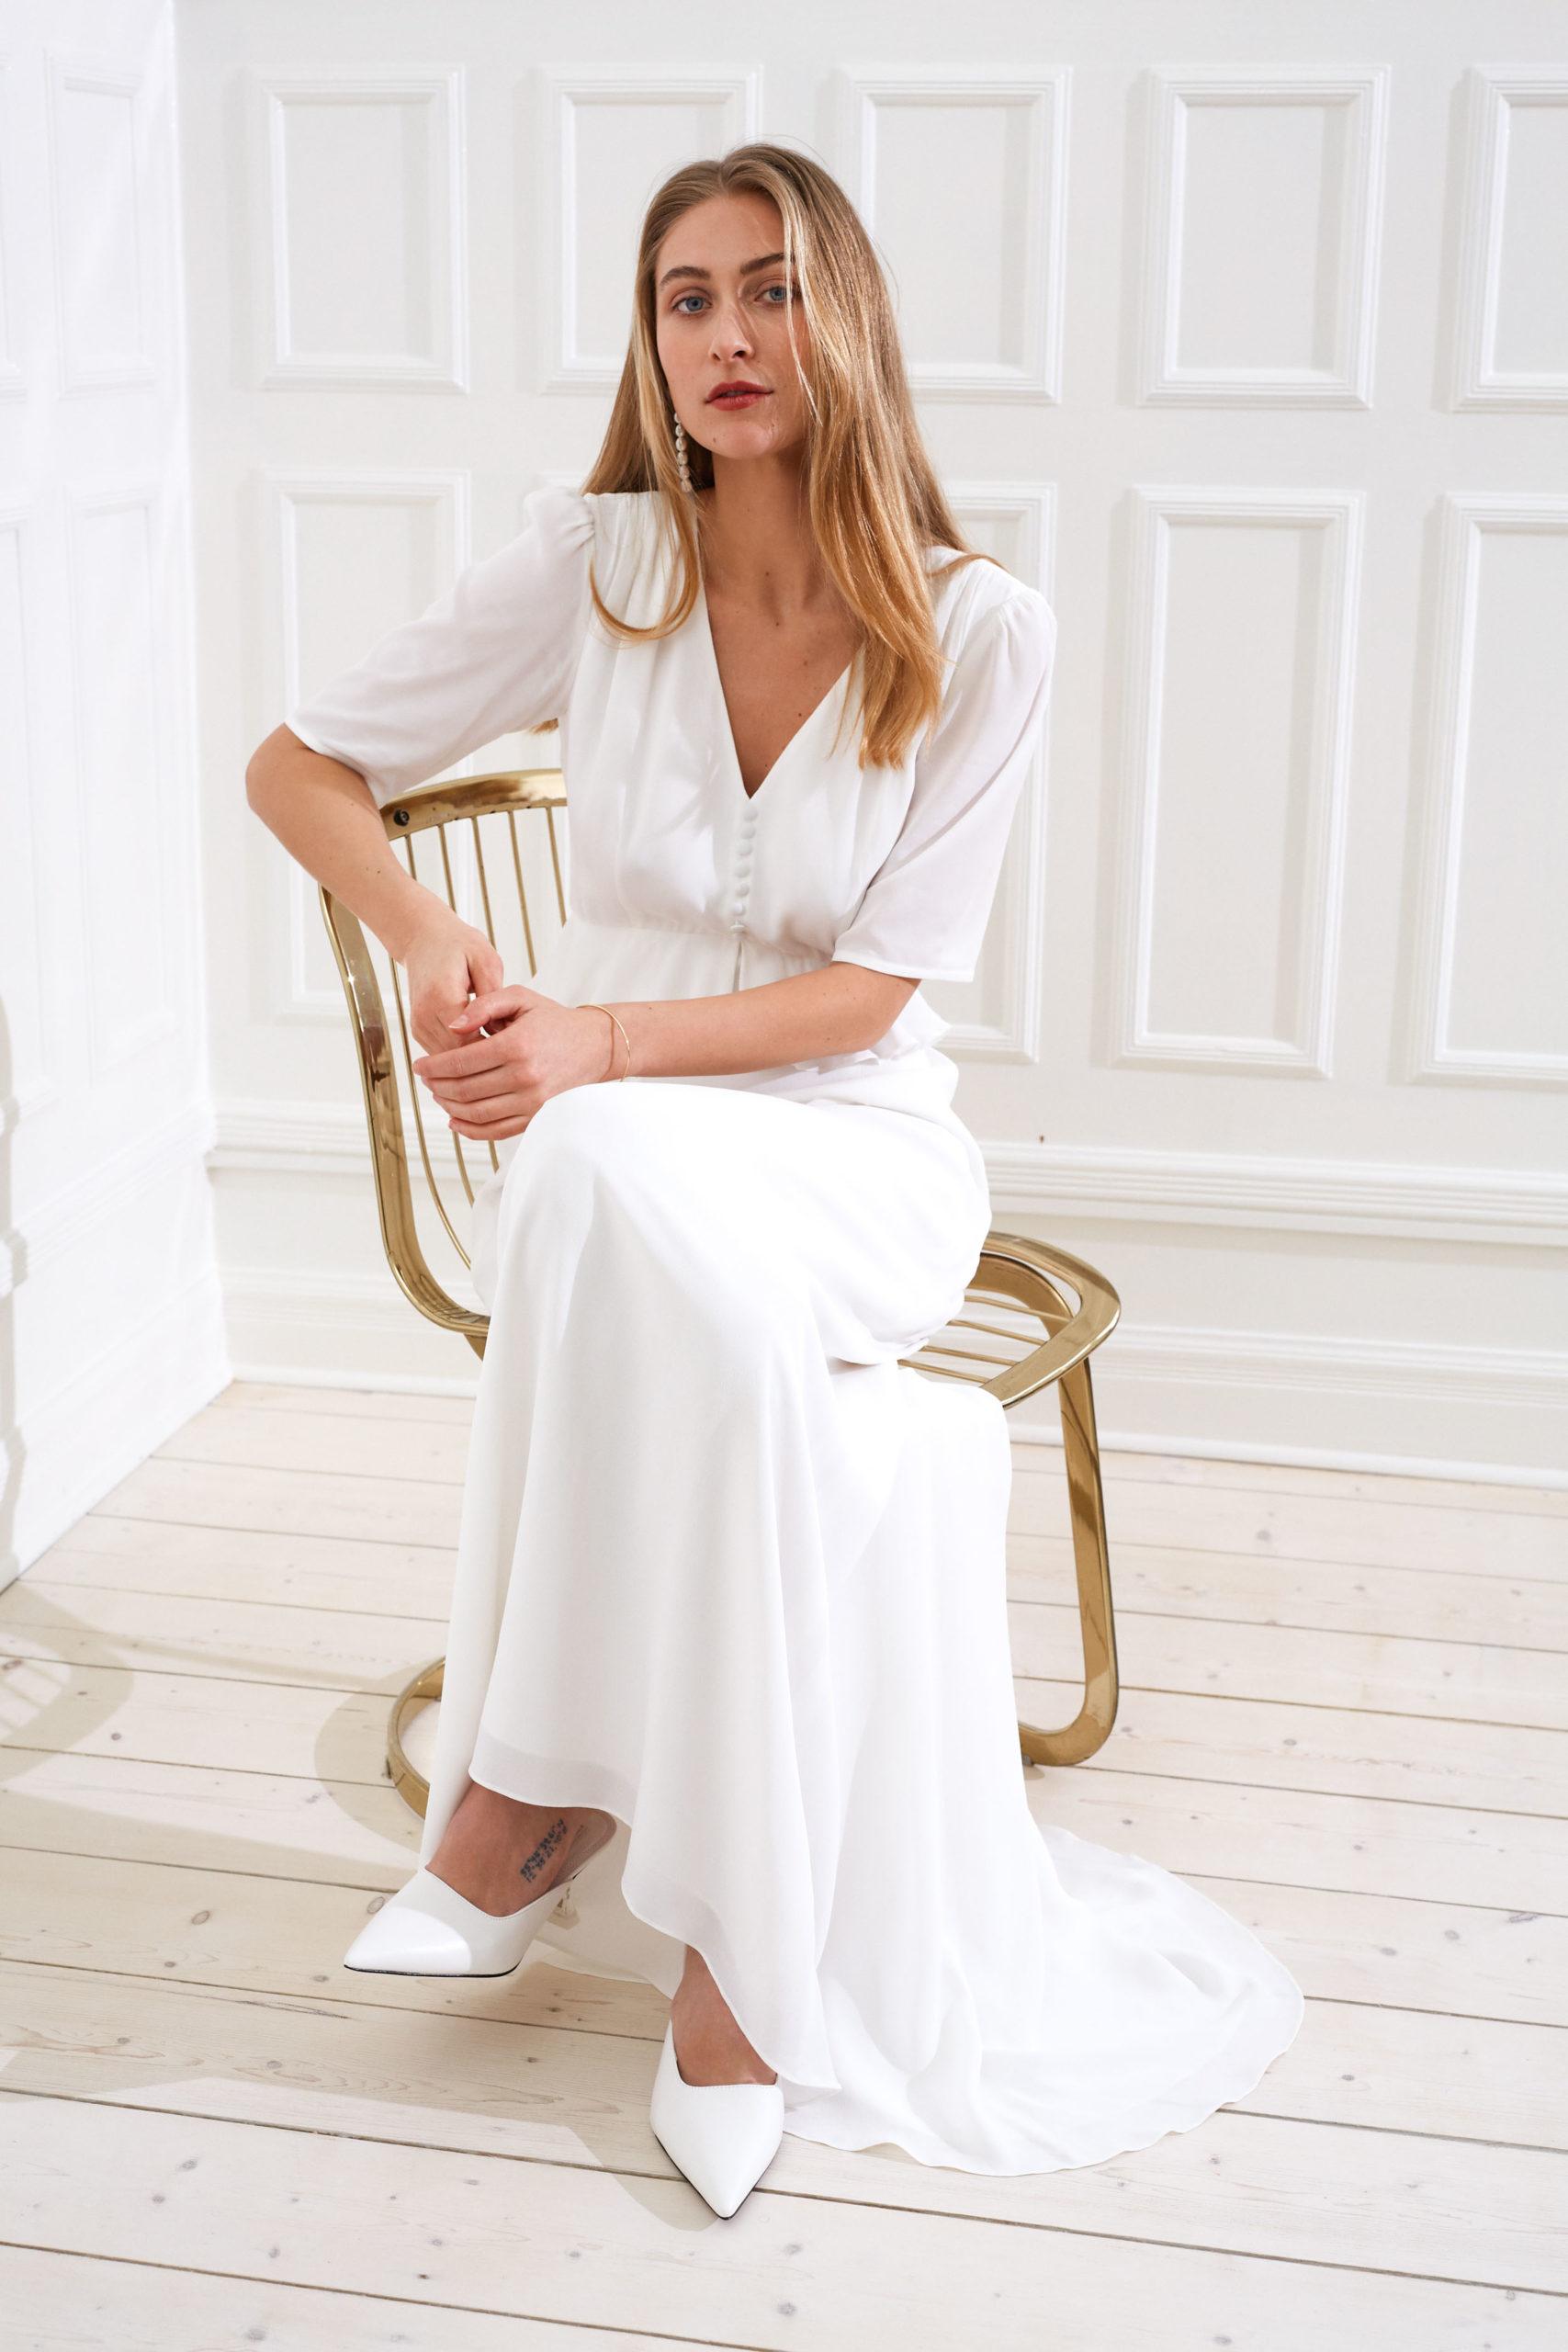 Artemis - Bianca modern wedding dress with train